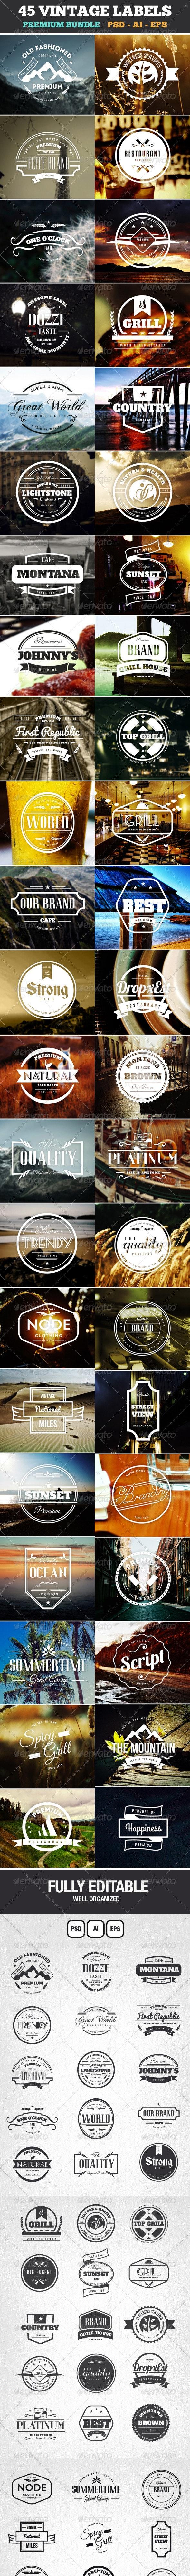 45 Vintage Labels & Badges Logos Bundle - Badges & Stickers Web Elements